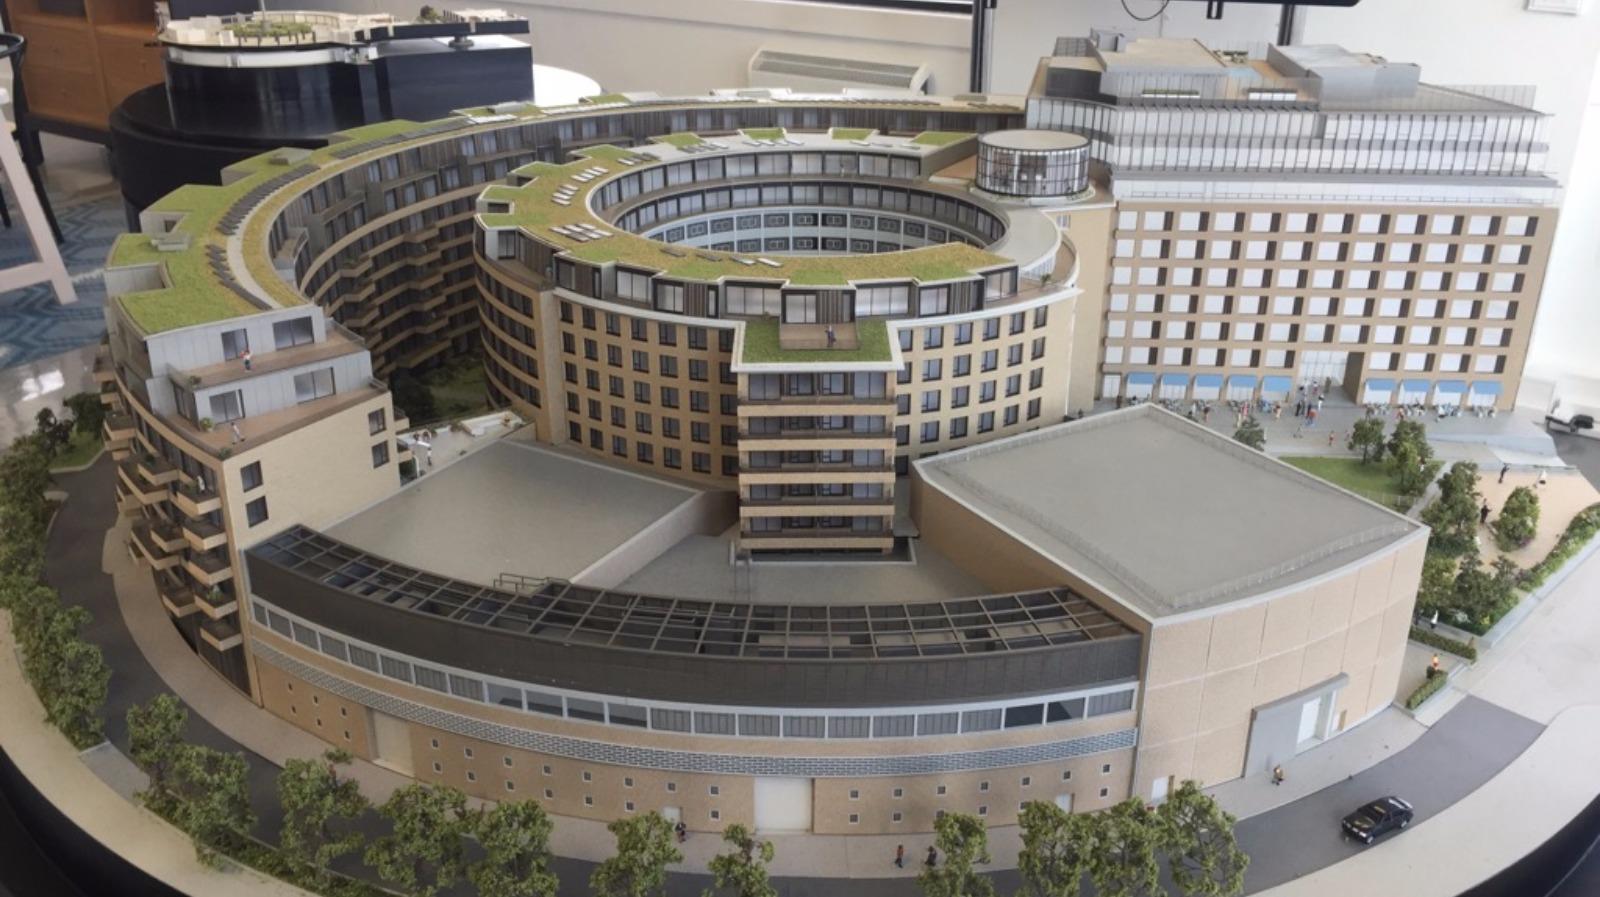 One Bedroom Flats At Former Bbc Tv Centre Start At 163 700k